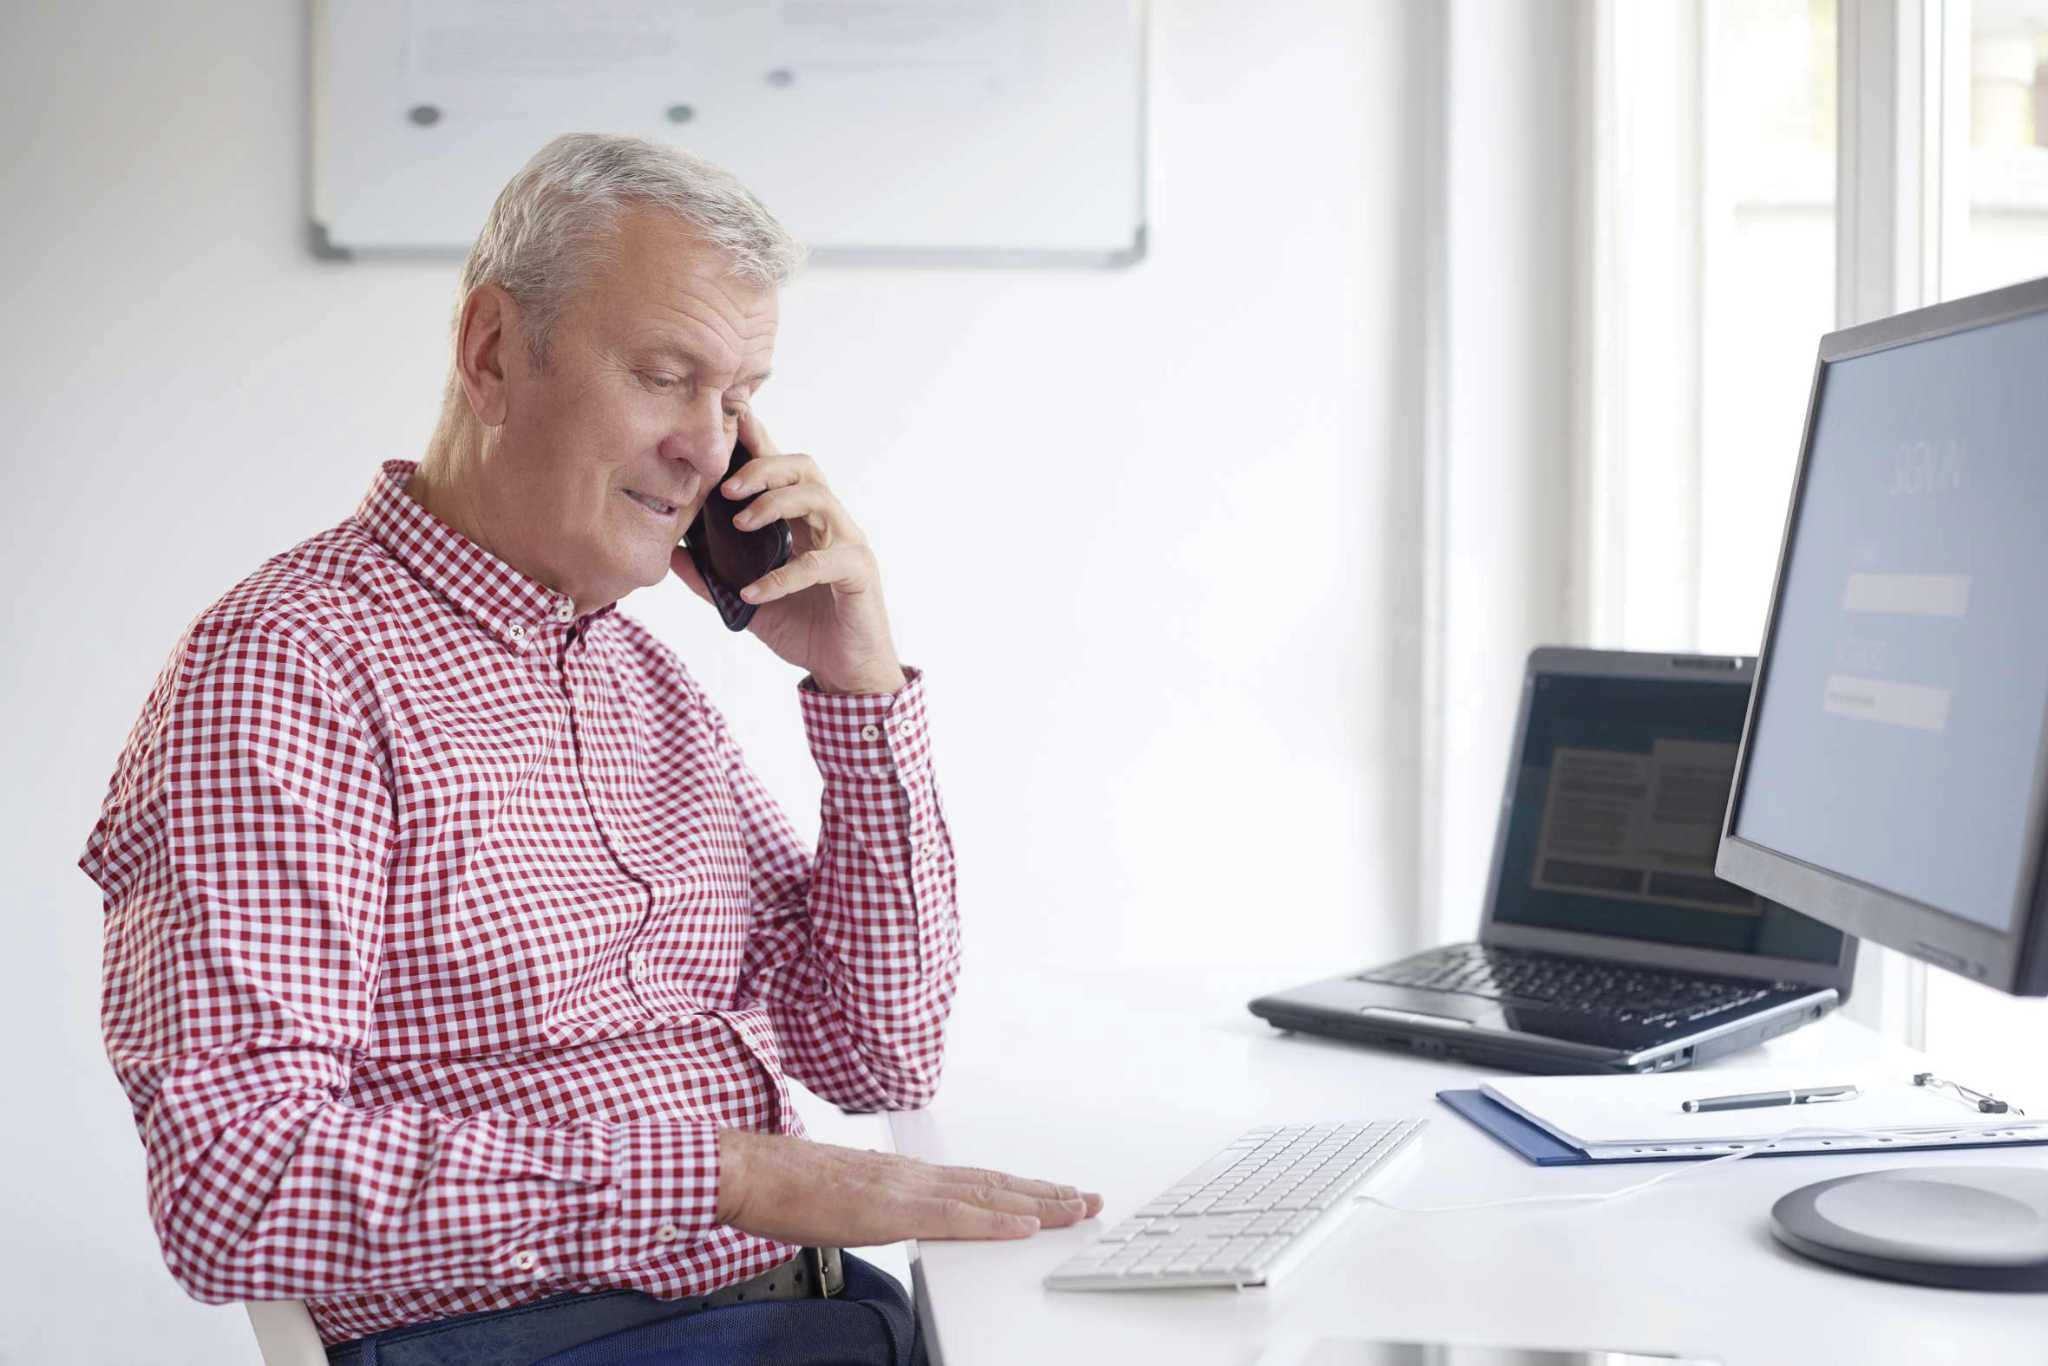 chron.com - Jan Burns | - Is telemedicine the future of medicine?